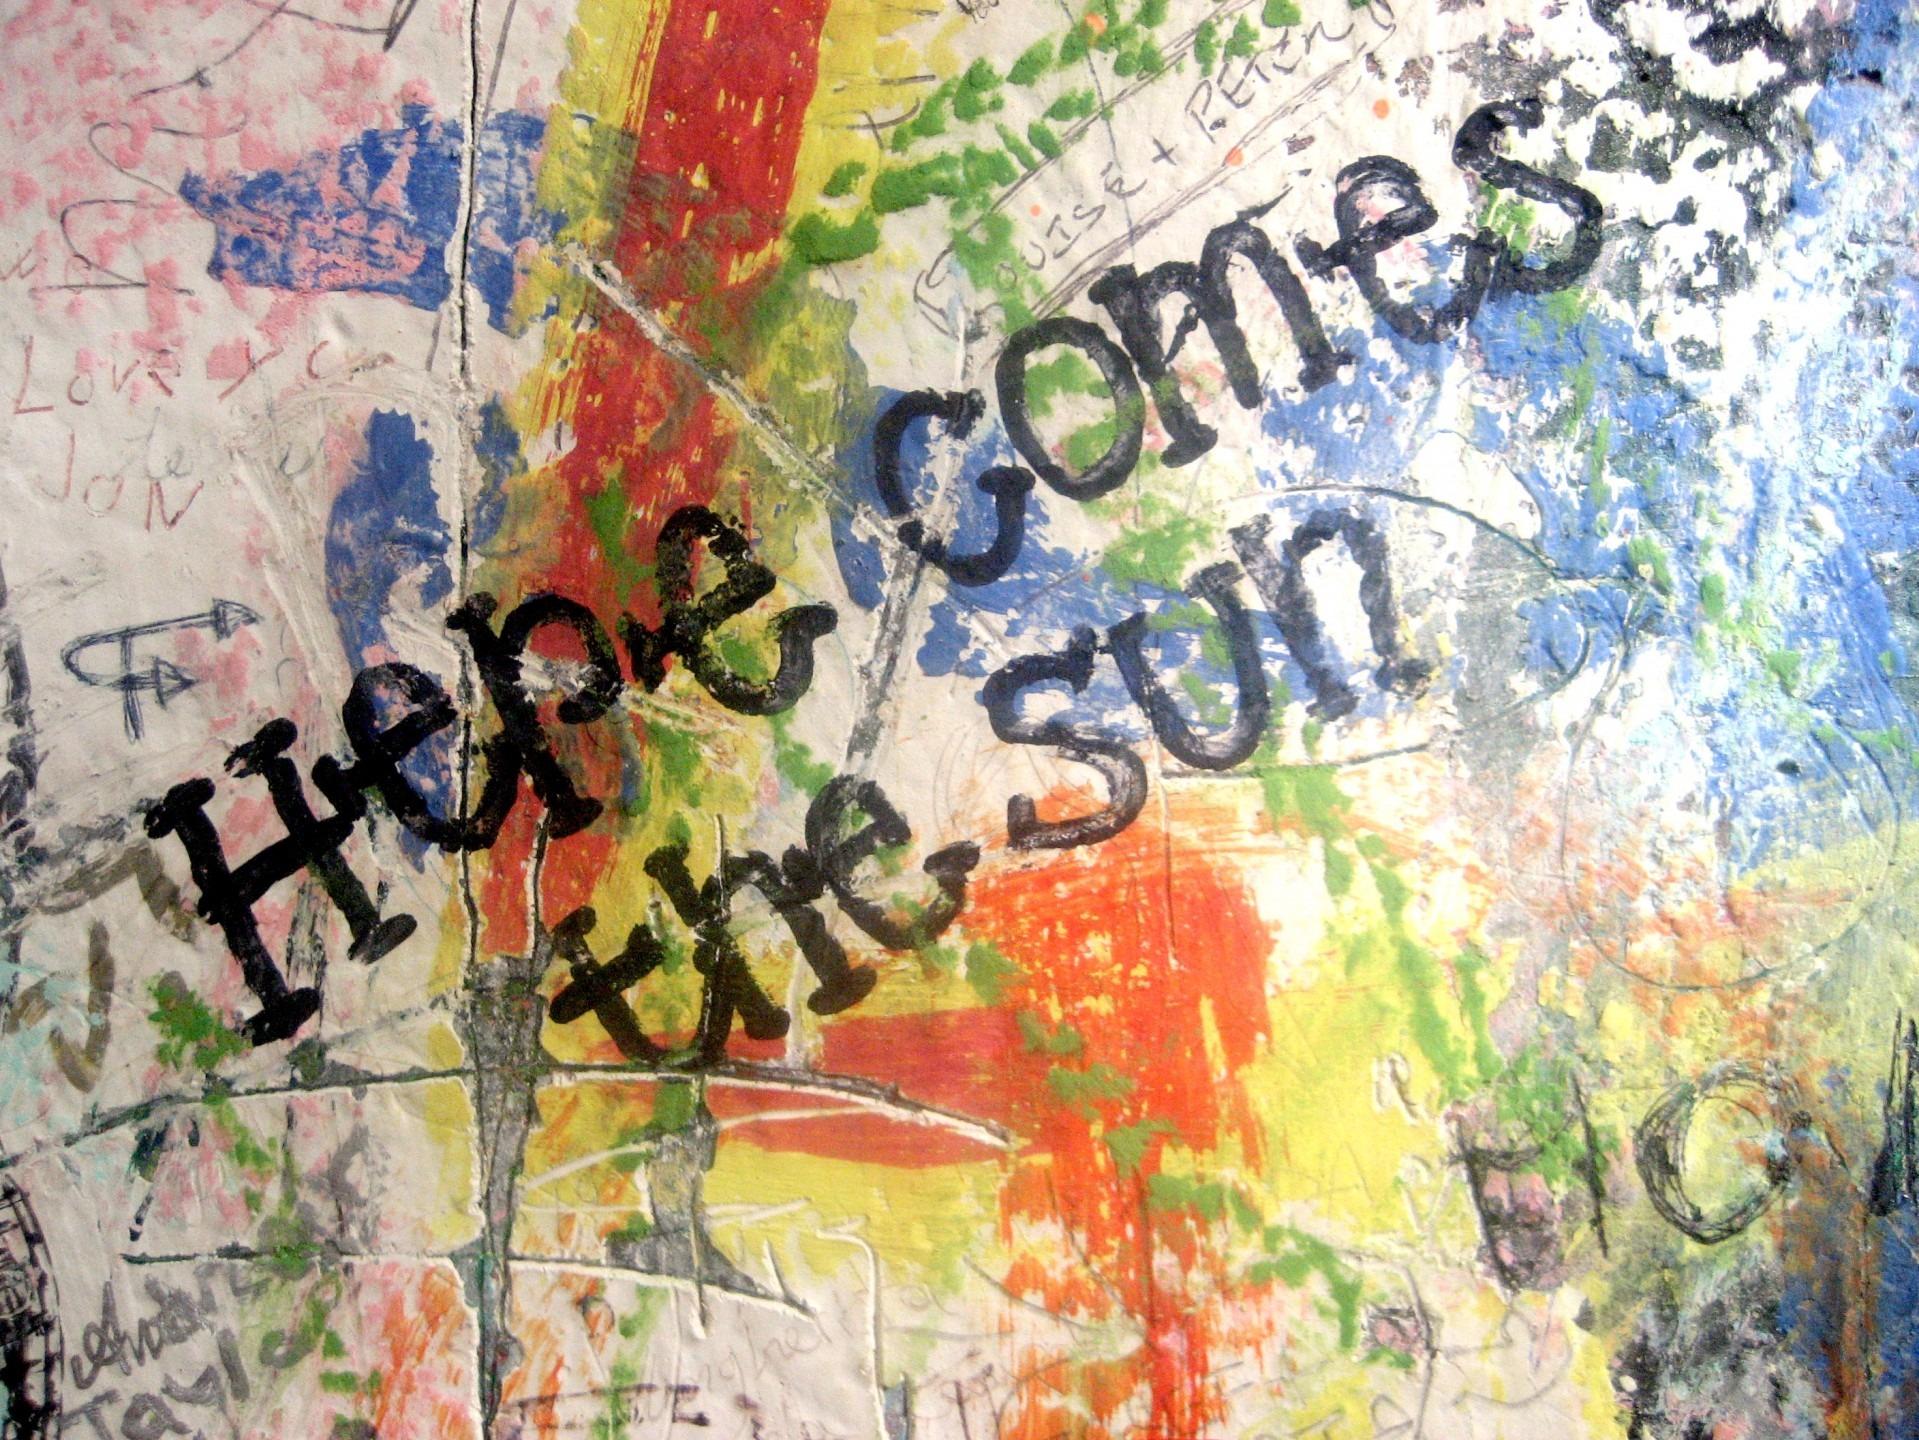 Sun warm summer spring graffiti painting art mural lyrics modern art